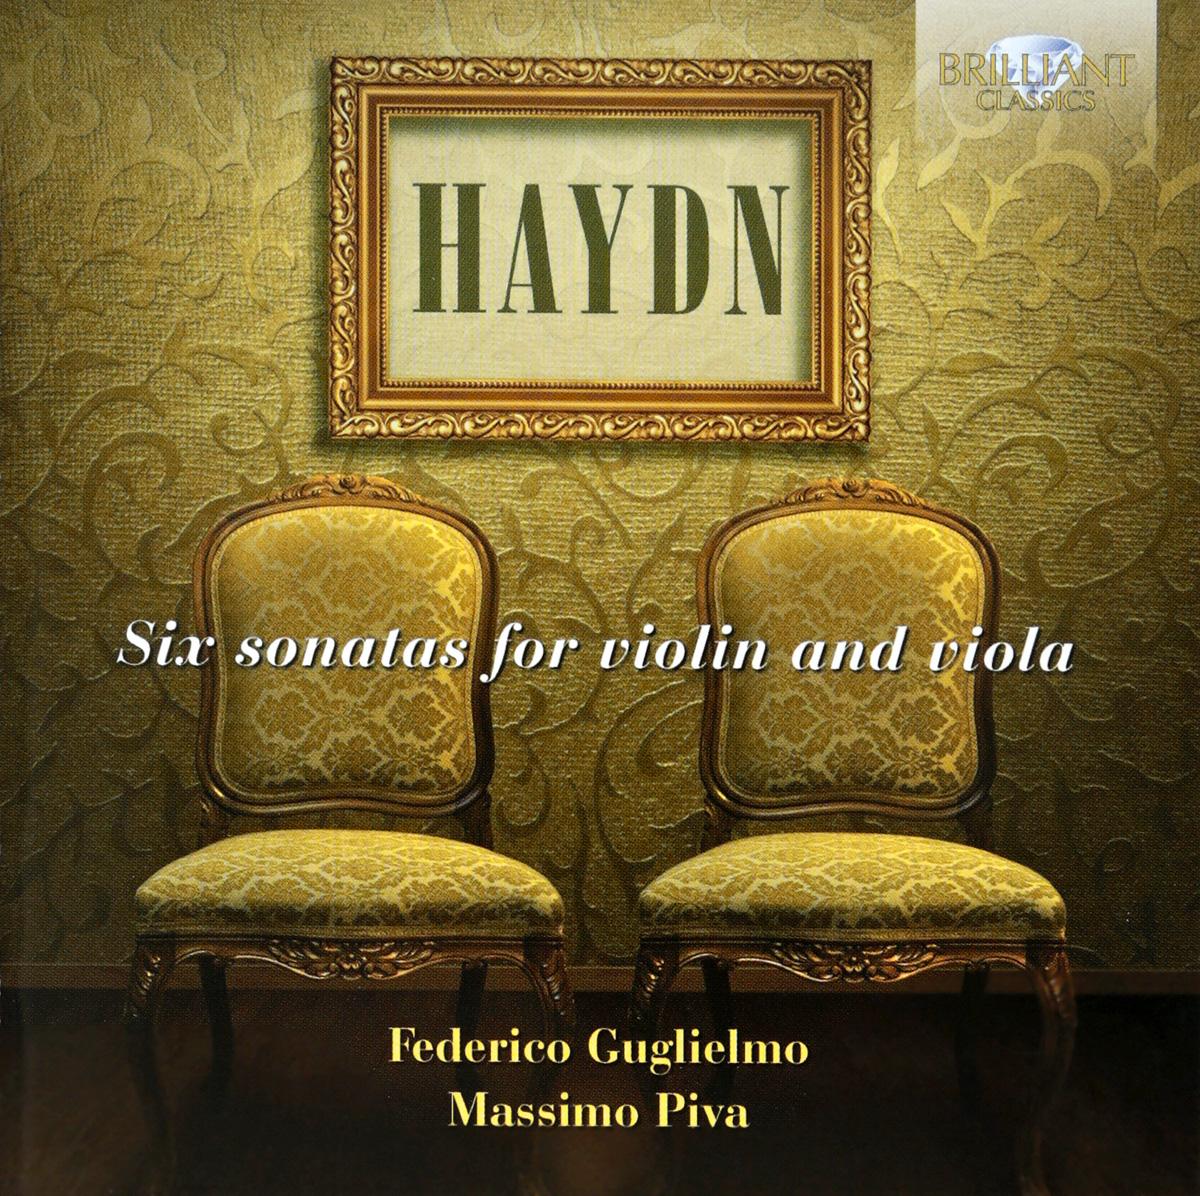 Haydn James J. Haydn. Six Sonatas For Violin & Frederico Guglielmo Massimo Piva james cochran j informs abok